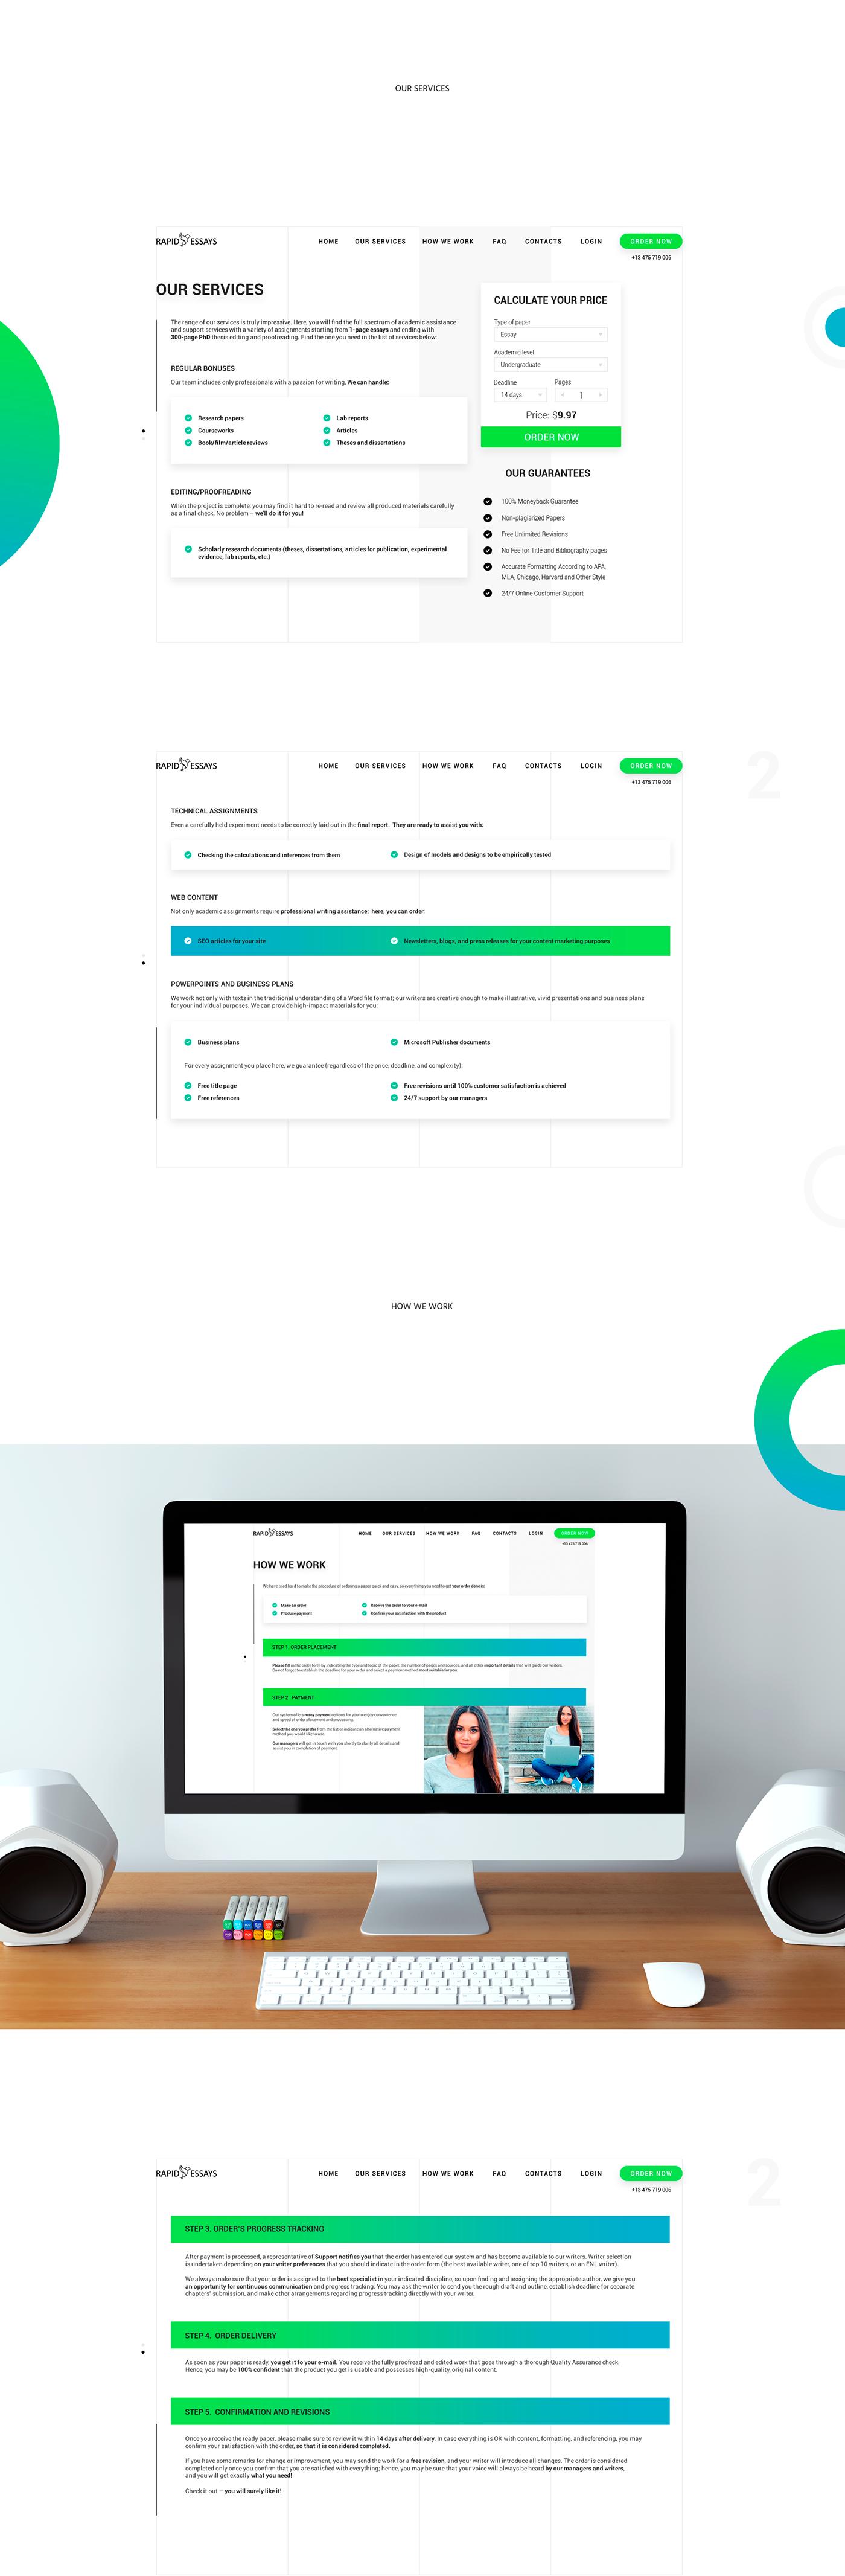 Webdesign uidesign UserInterface UserExperience ux essay essays creative ui design writer